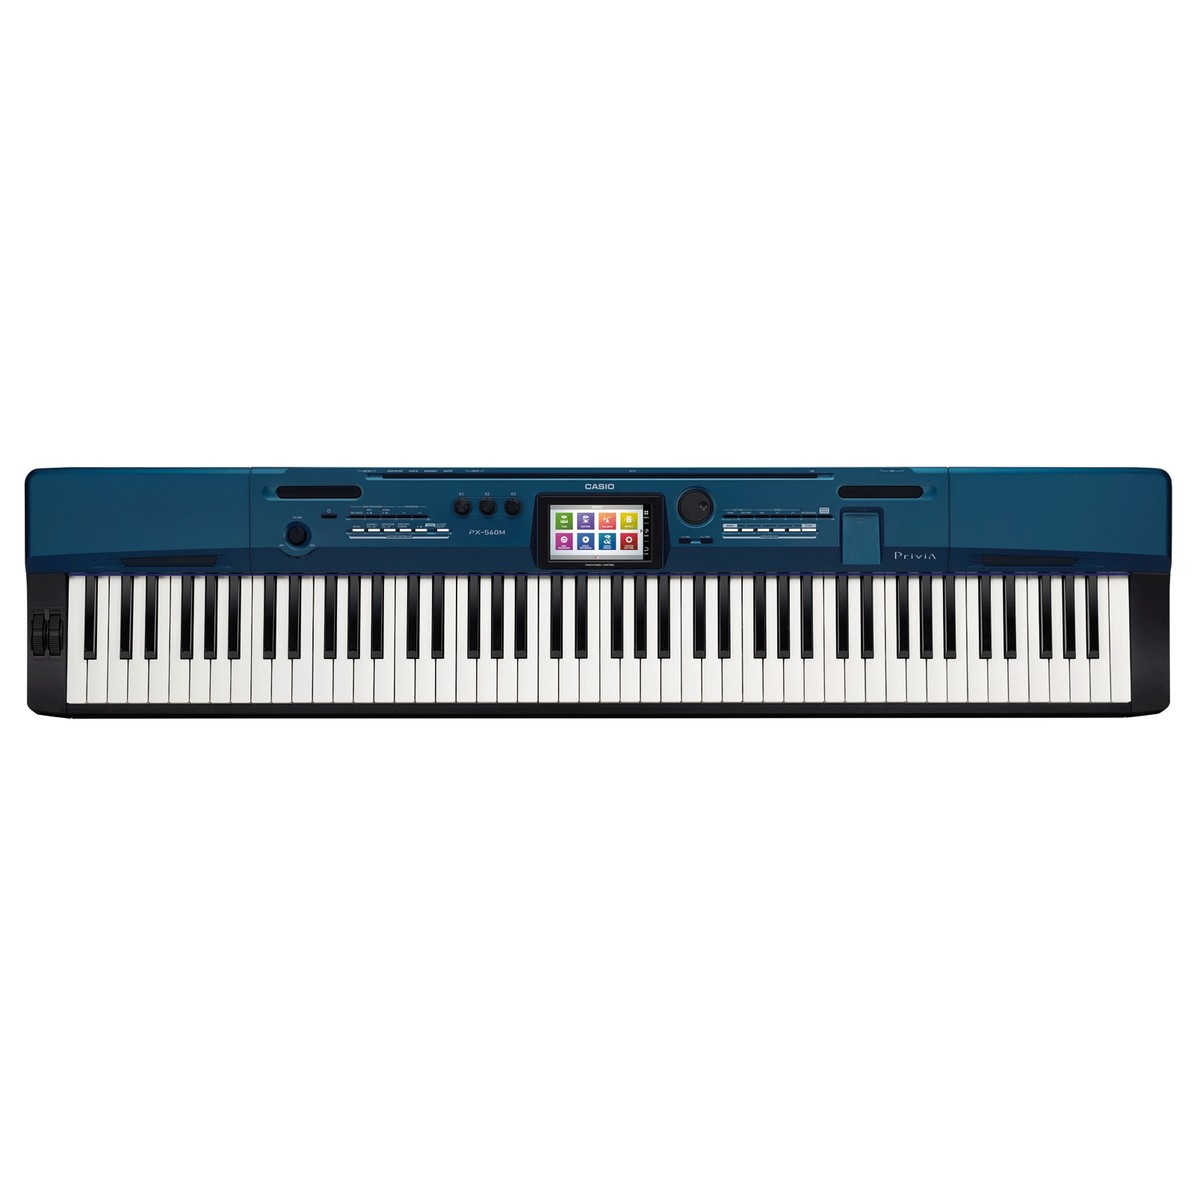 Image of Casio Privia PX-560 Stage Piano